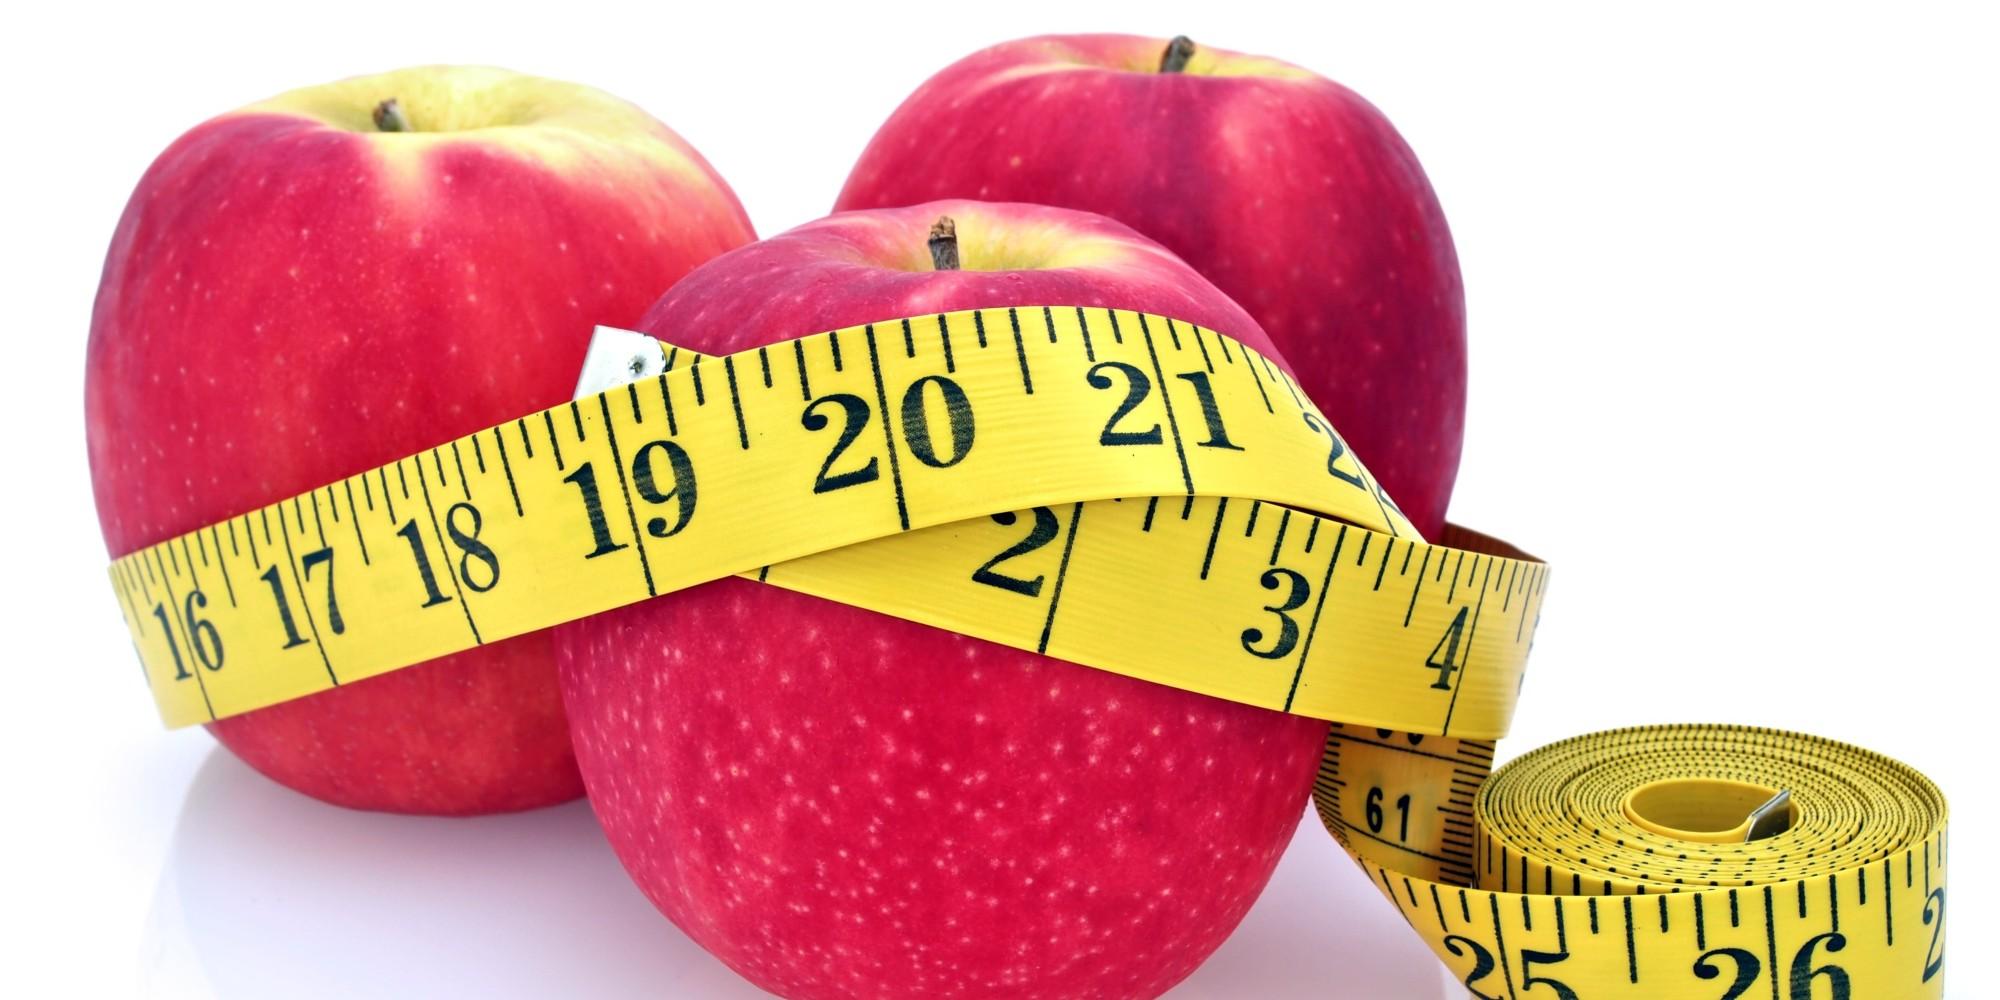 Cómo iniciar una dieta exitosa | HuffPost